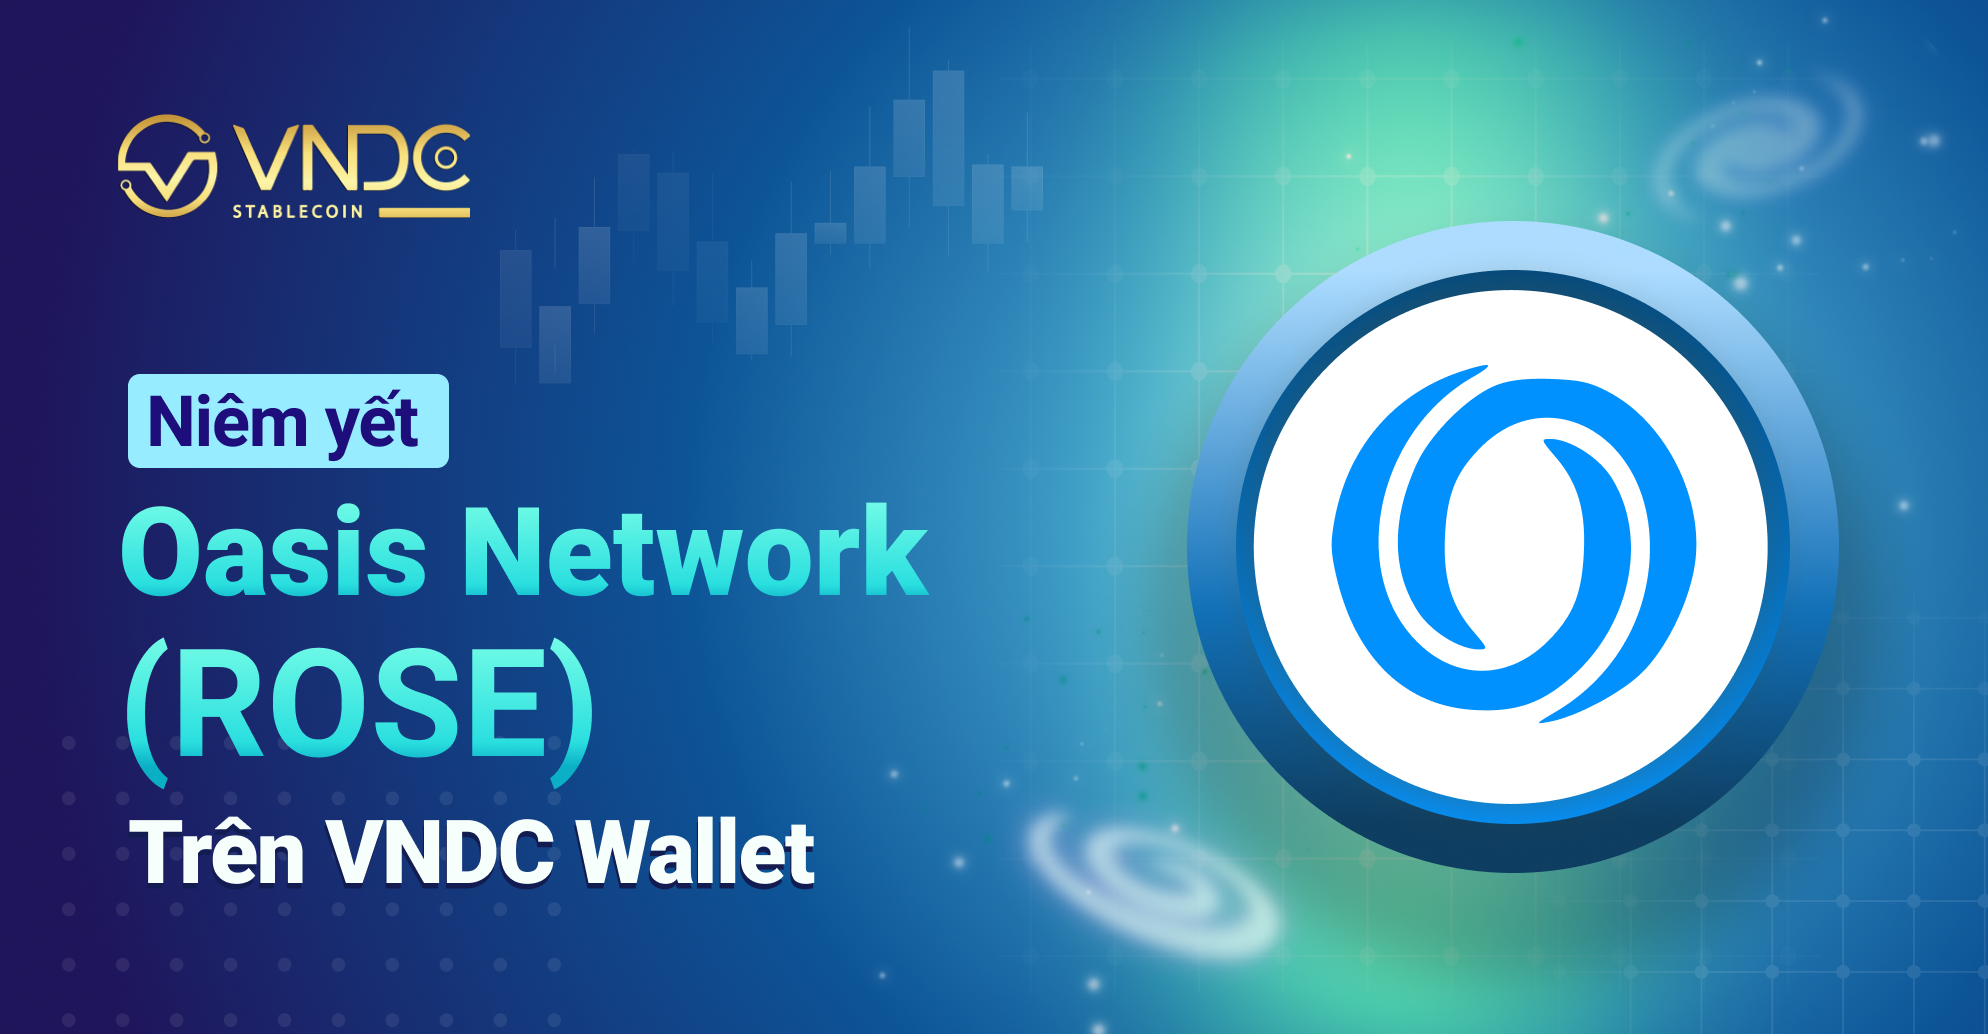 Niêm yết Oasis Network Token (ROSE) trên VNDC Wallet